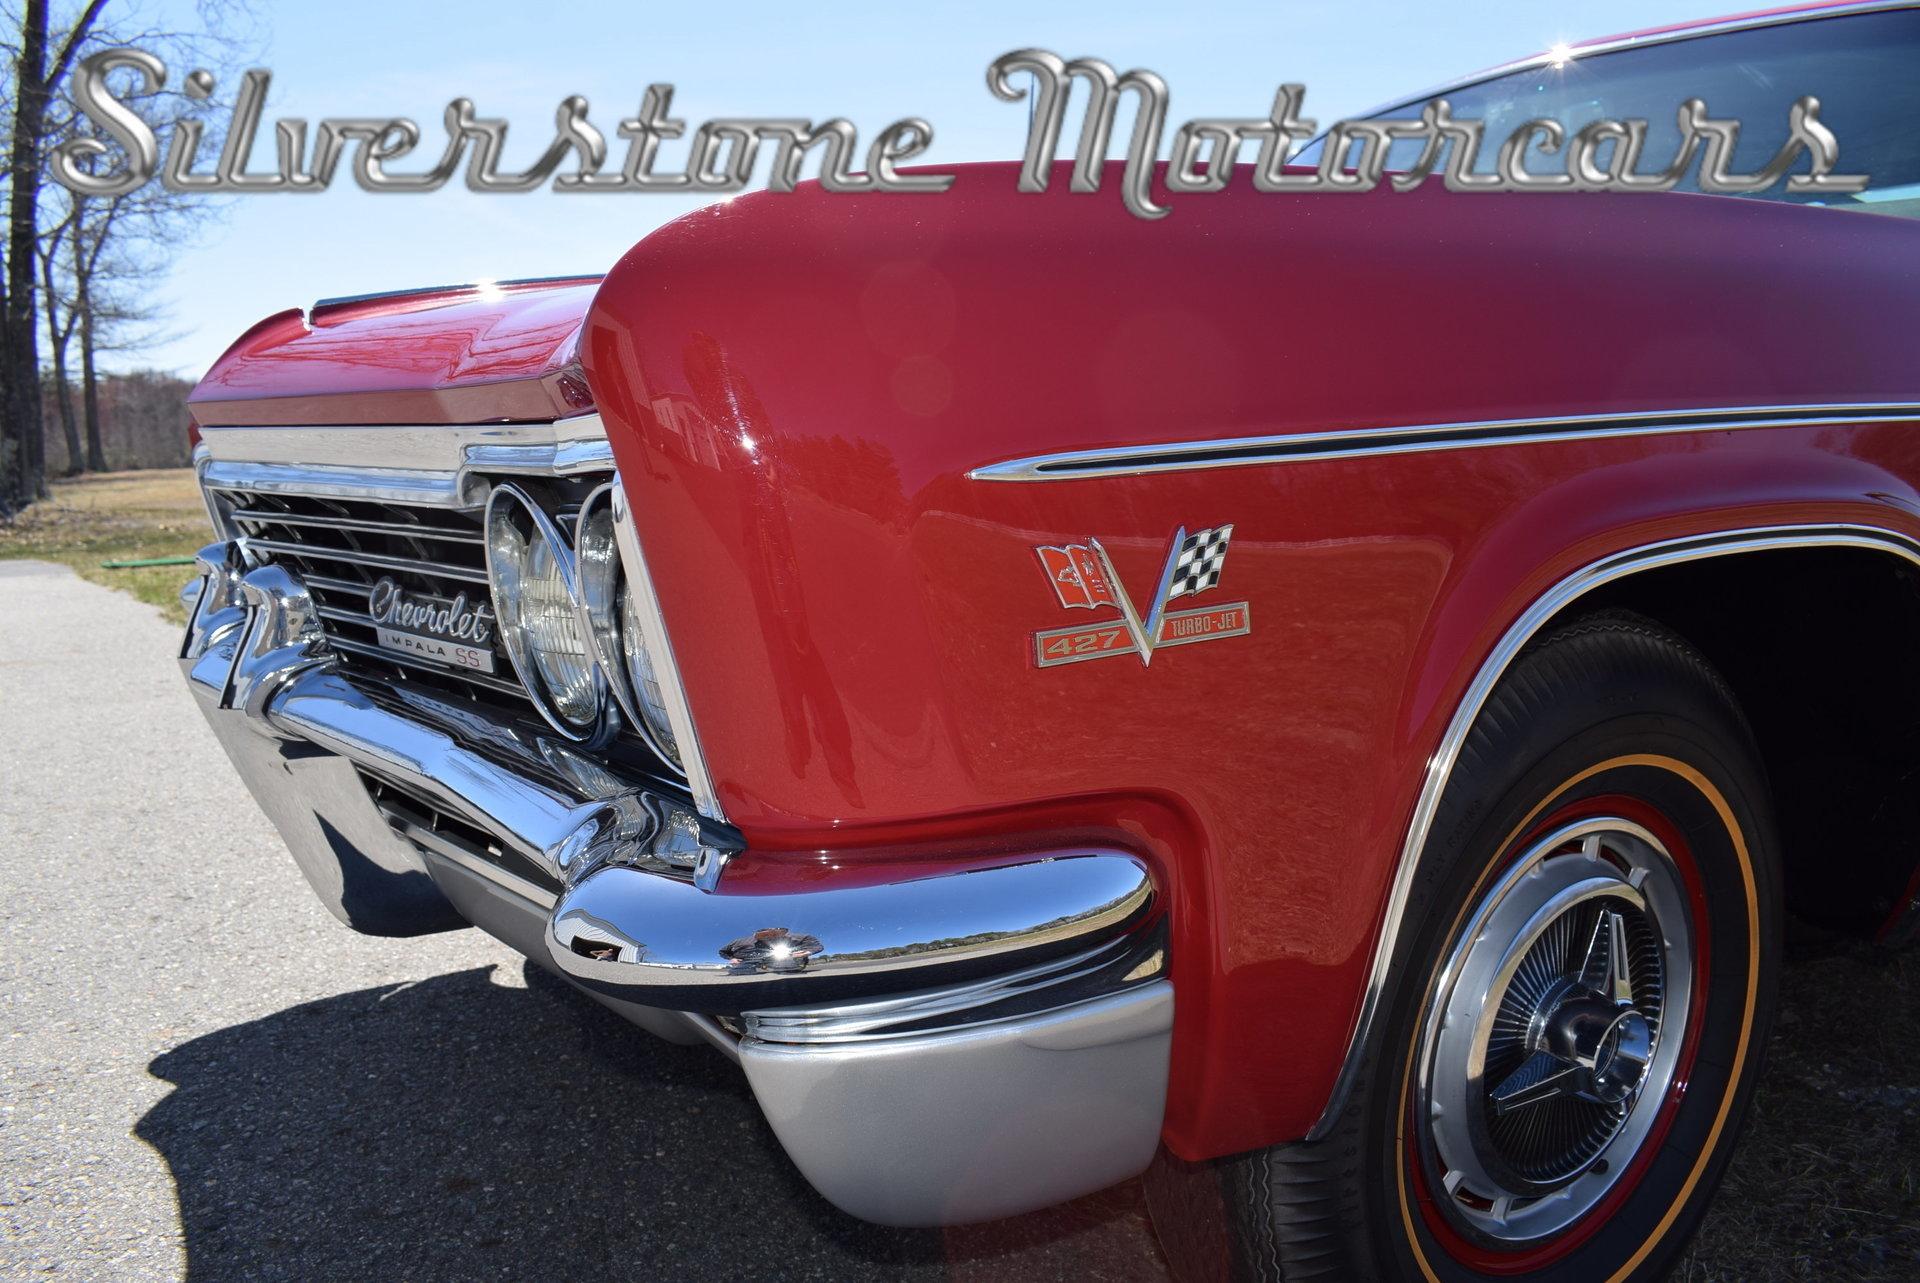 1966 Chevrolet Impala Silverstone Motorcars Chevy Ss 427